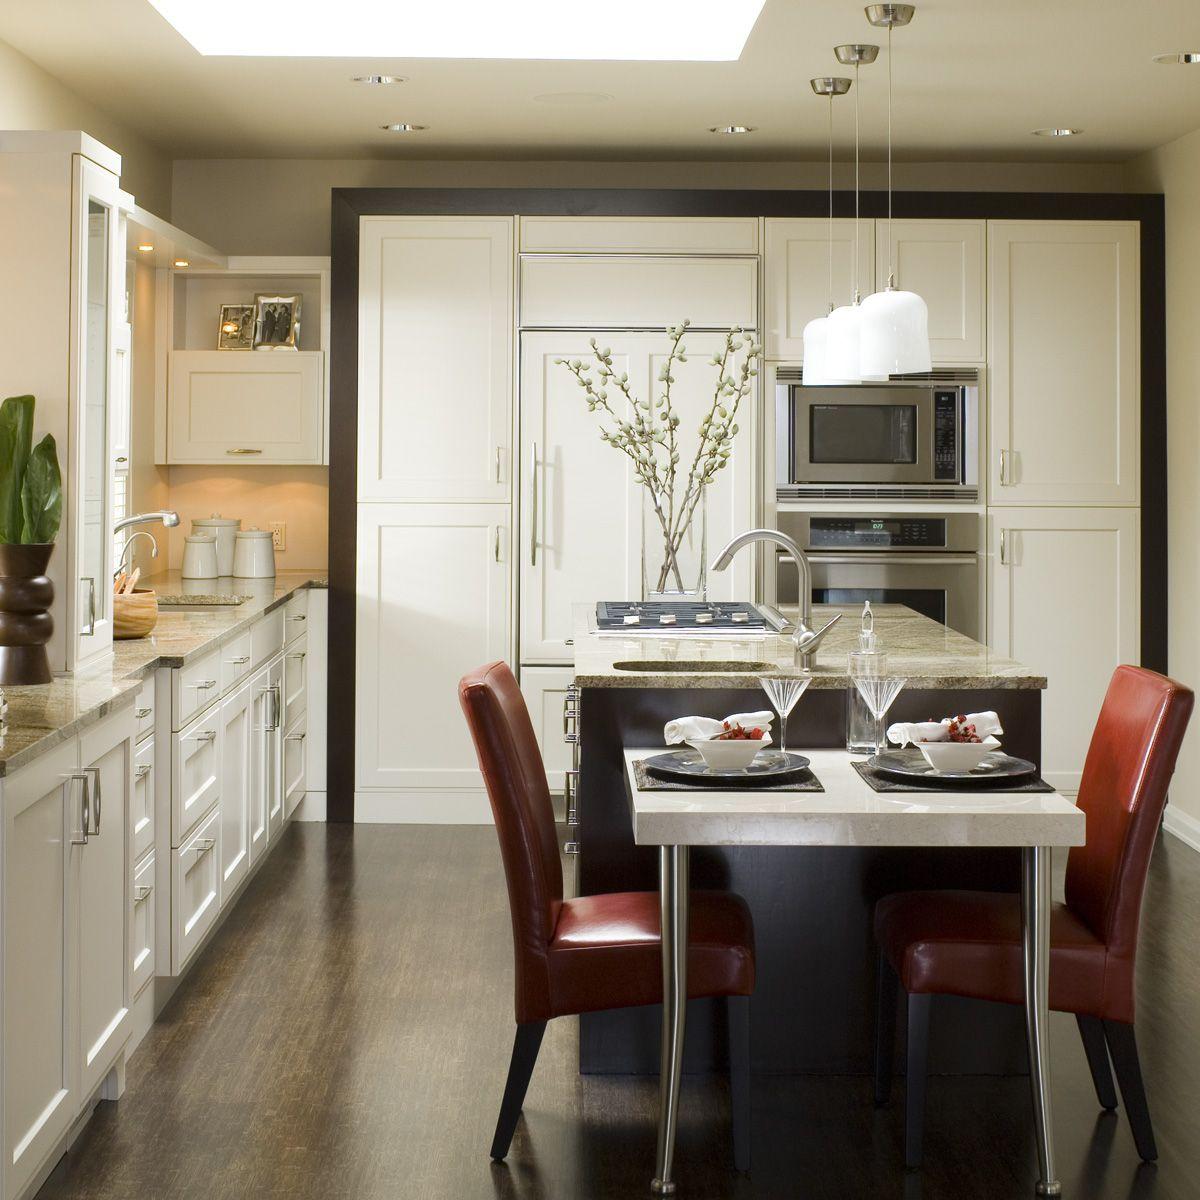 Contemporary Kitchen Portland Or  Kitchen Curtains Kitchens And Best Designer Kitchen Curtains Decorating Inspiration